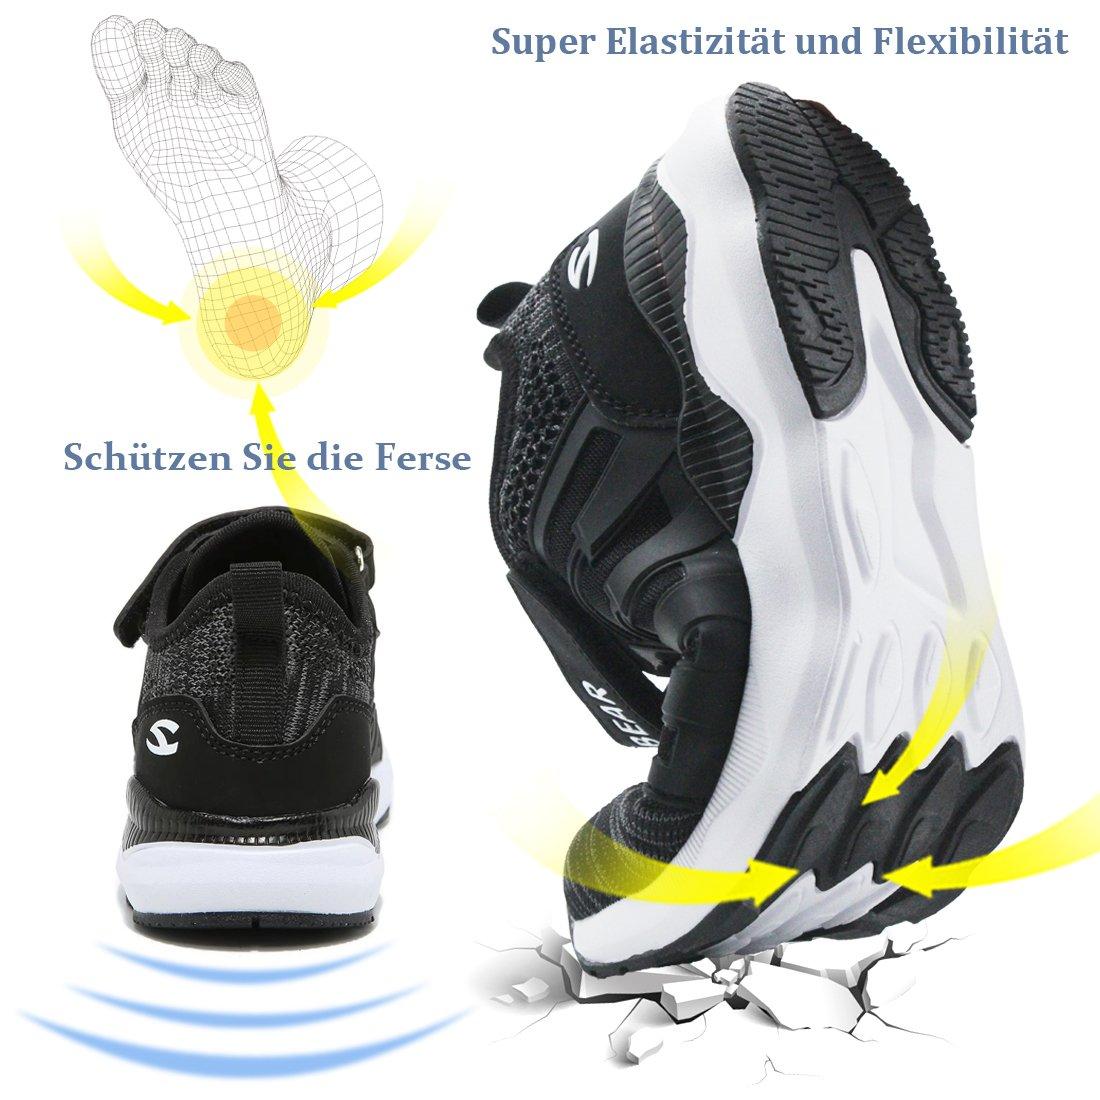 Chaussure Enfants Sneakers Fille Gar/çon Sport Runing Shoes Walking Outdoor Basket Comp/étition Entra/înement